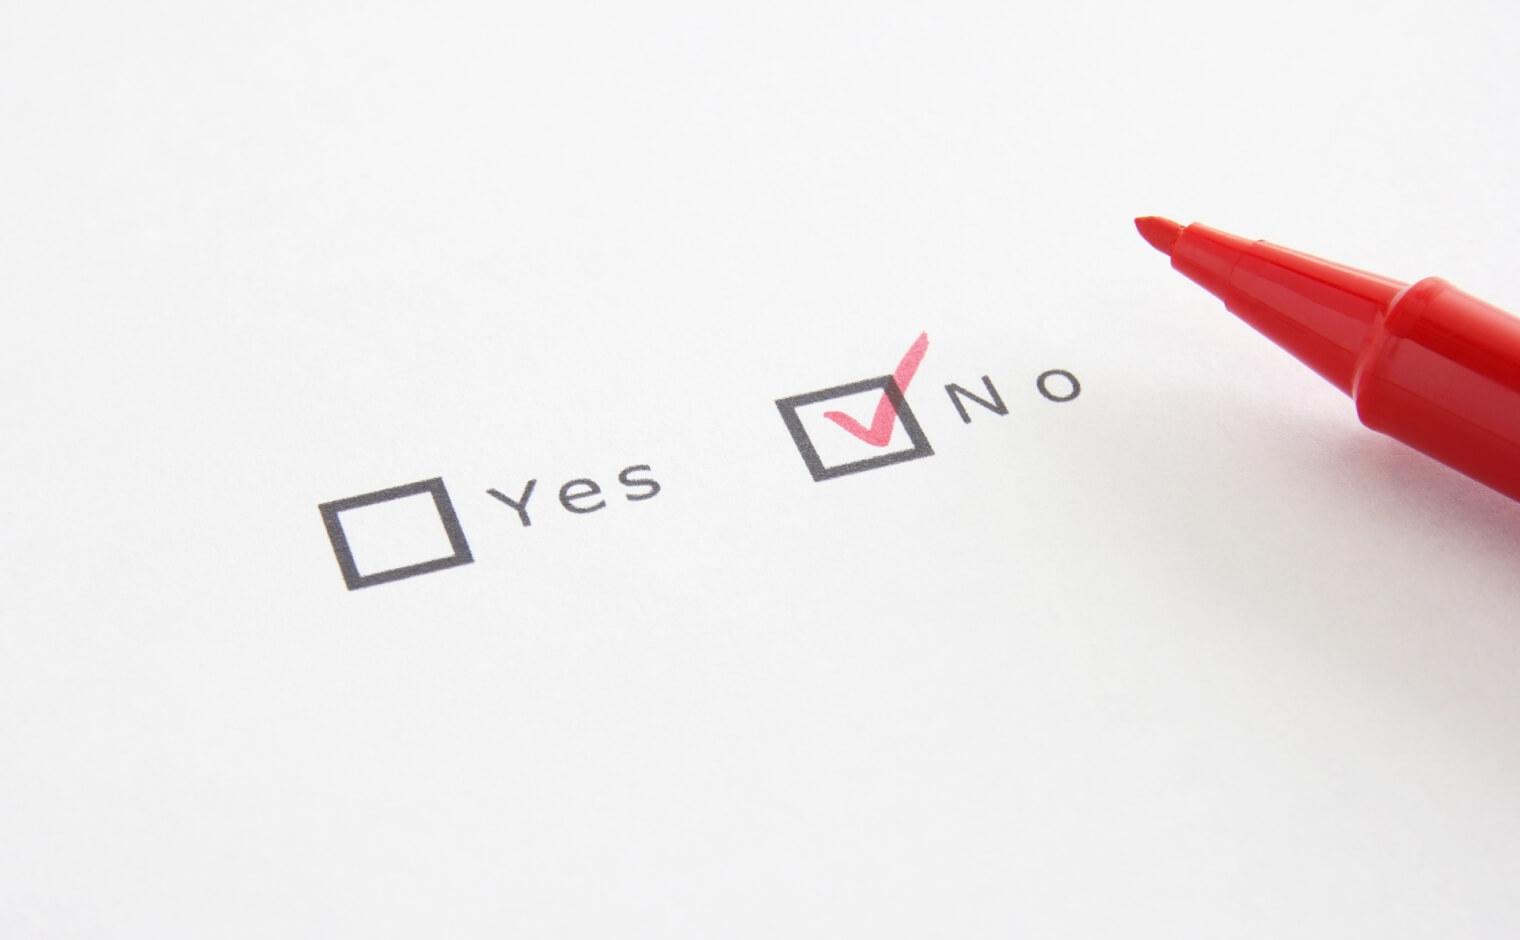 質問票に虚偽記載